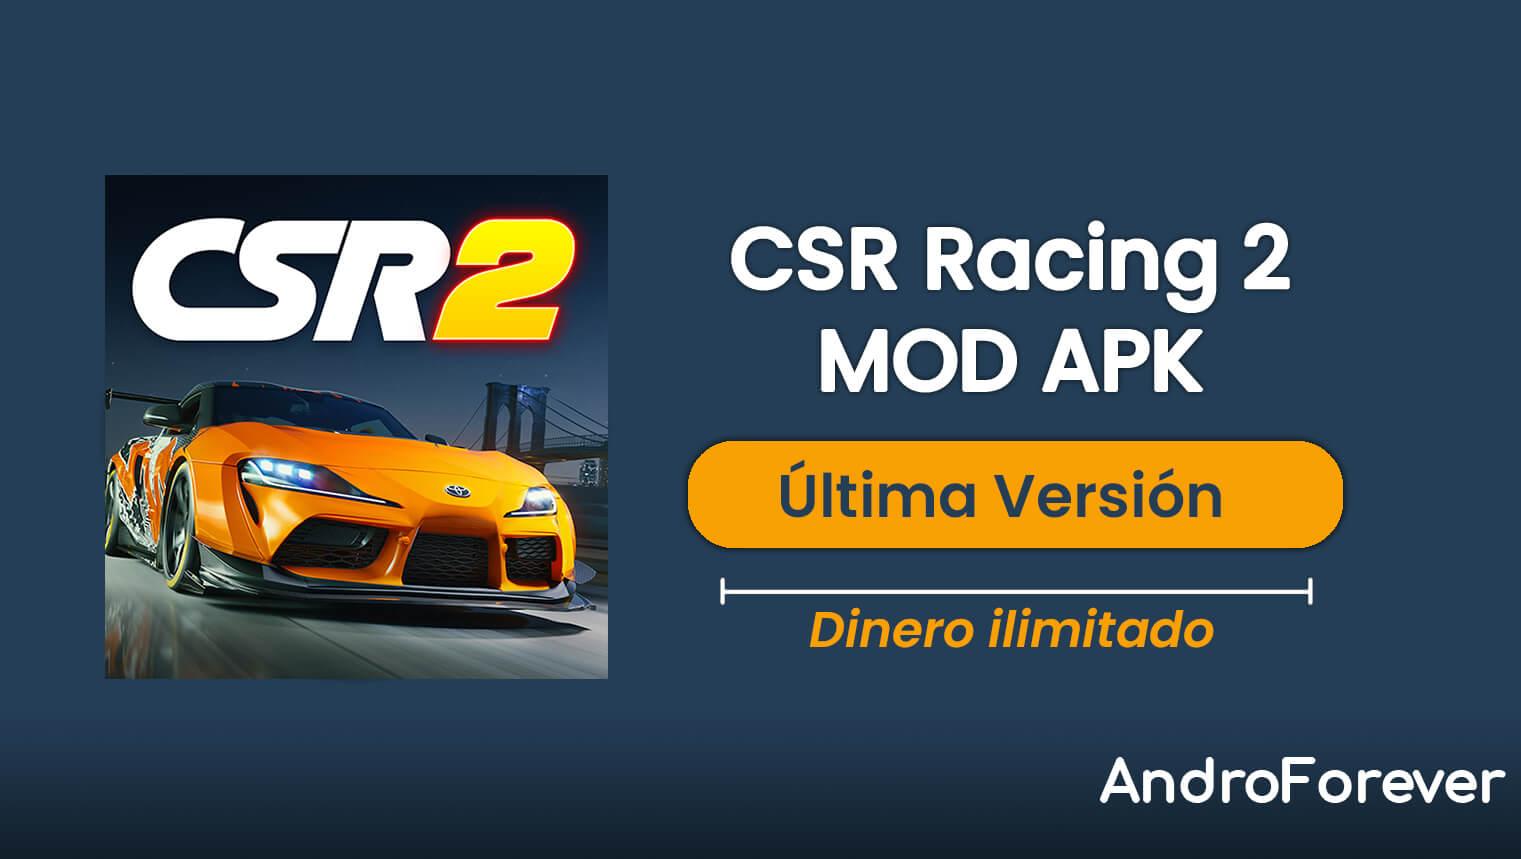 CSR Racing 2 MOD APK 3.2.0 (MOD, Dinero ilimitado)